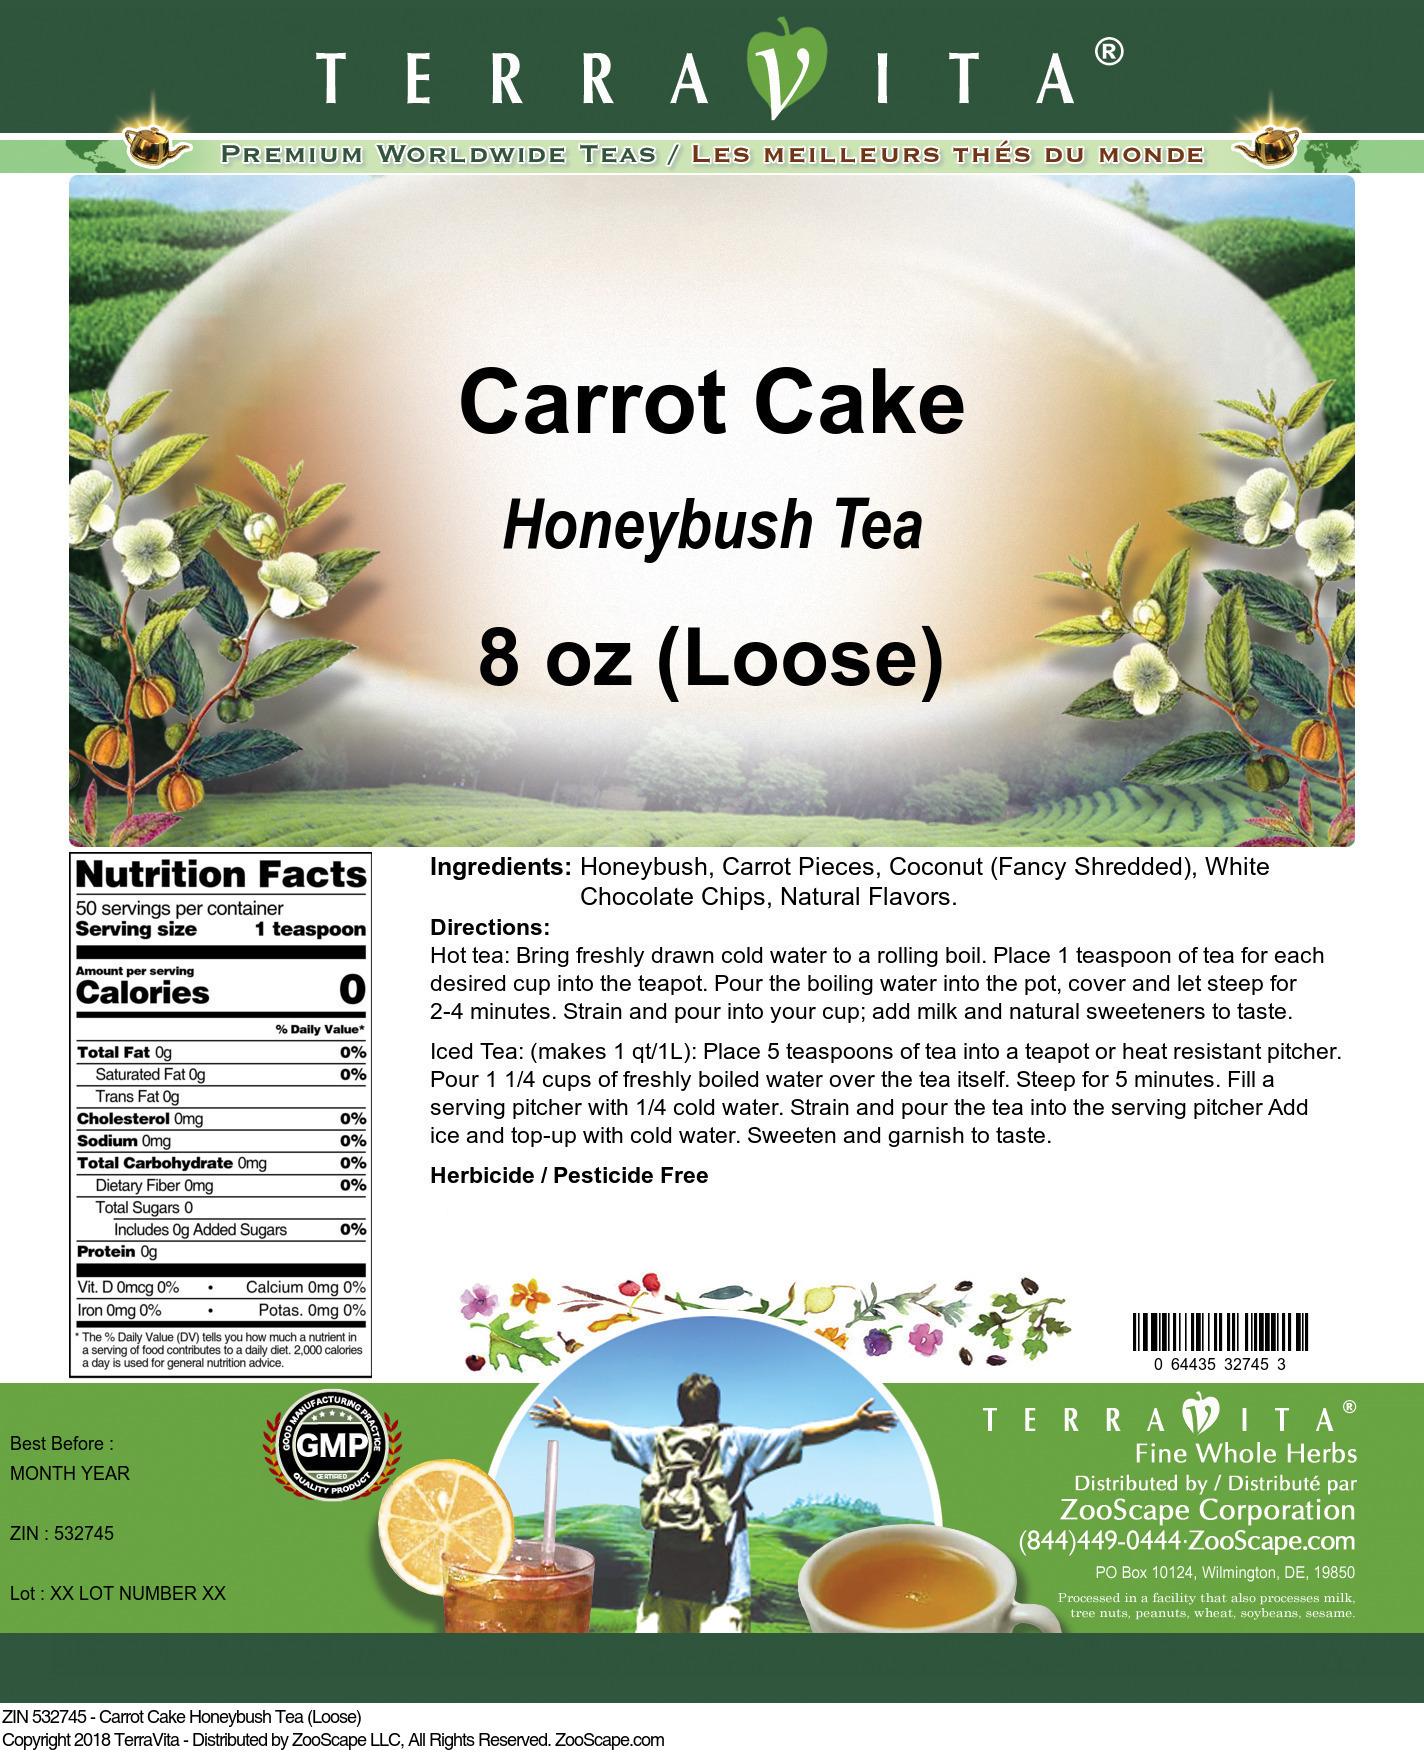 Carrot Cake Honeybush Tea (Loose)